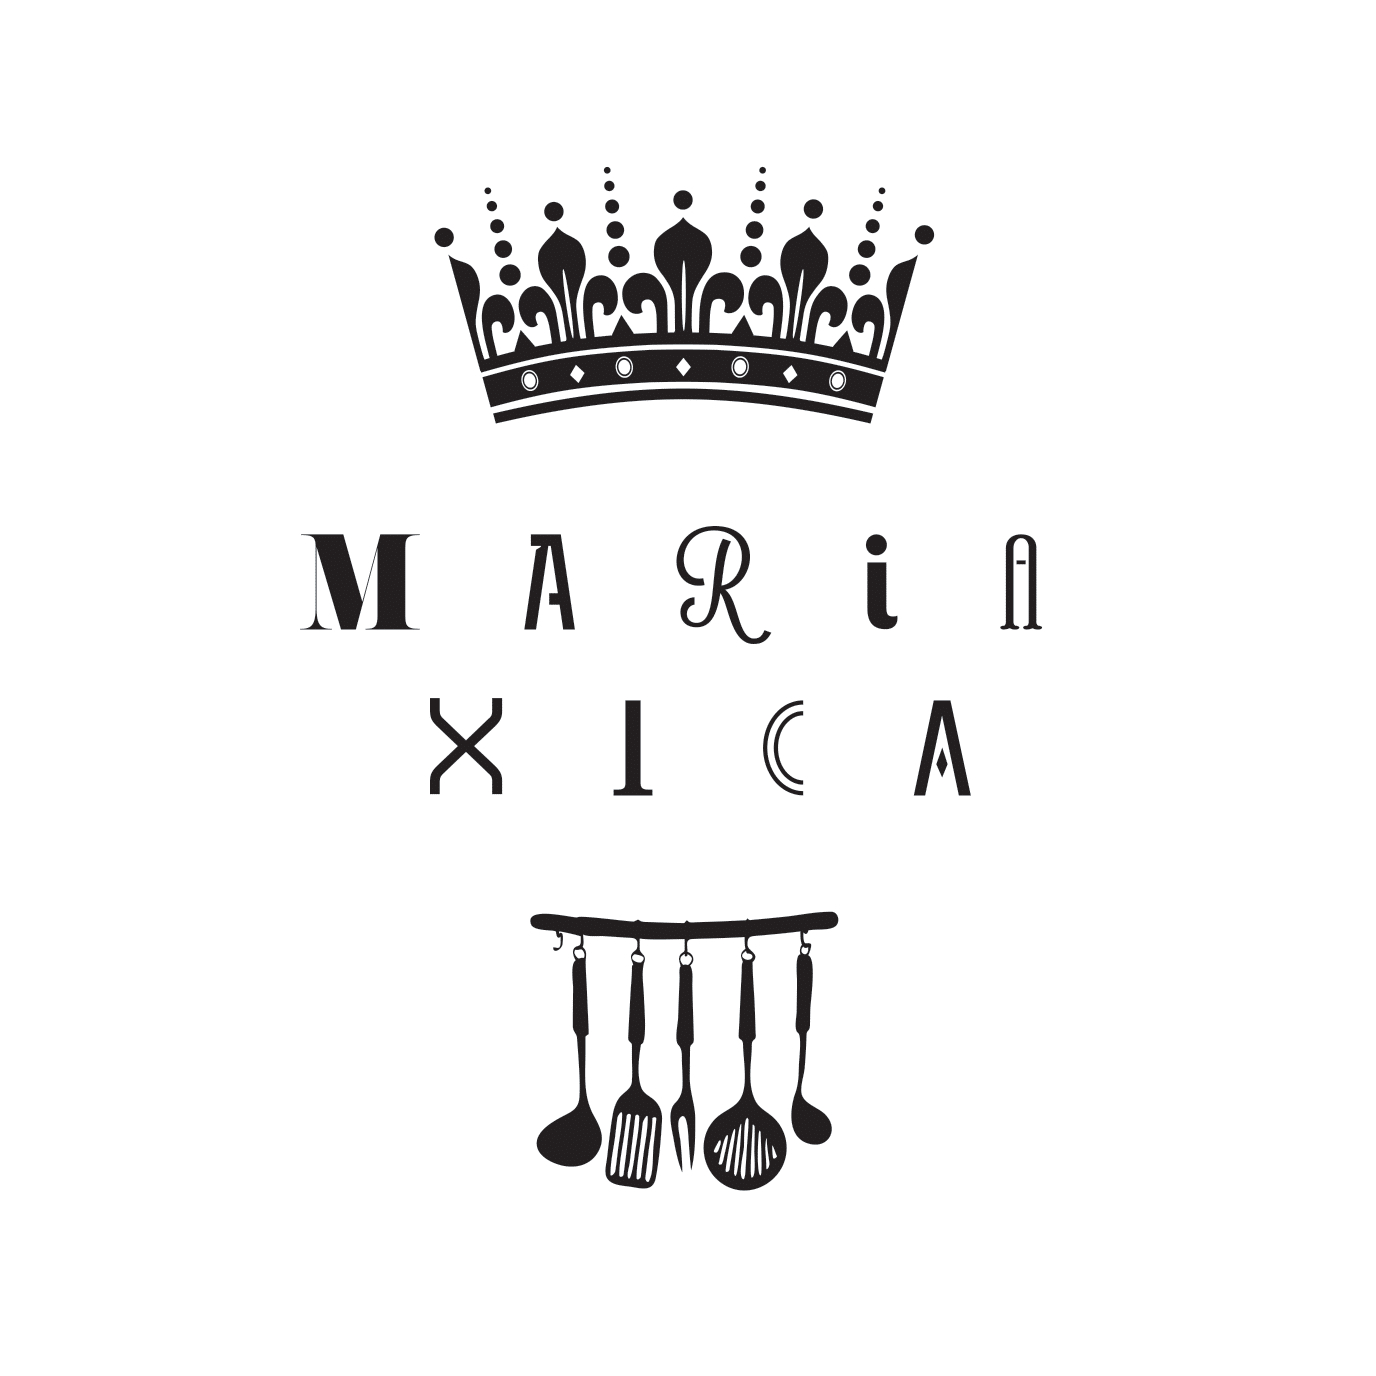 Maria Xica